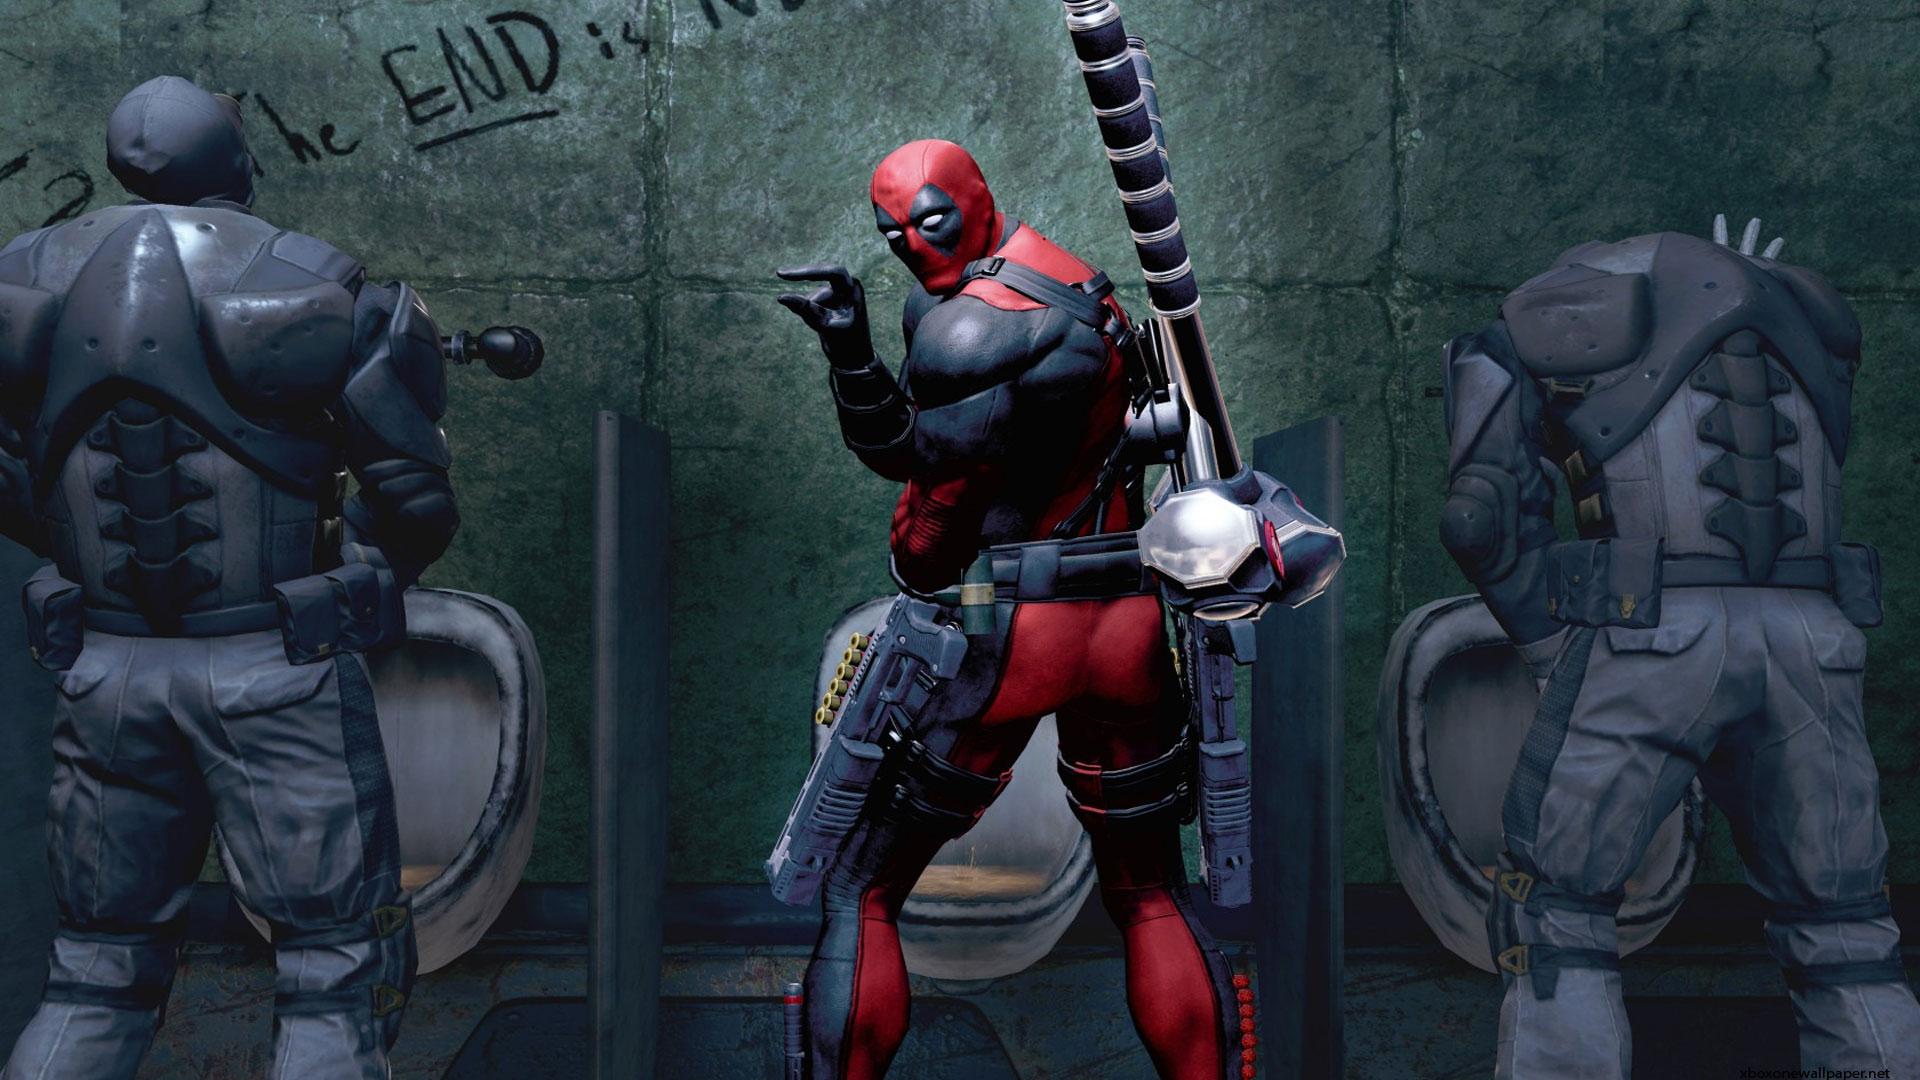 Marvel Deadpool The Game Wallpaper Photo HD 1080p 1920x1080